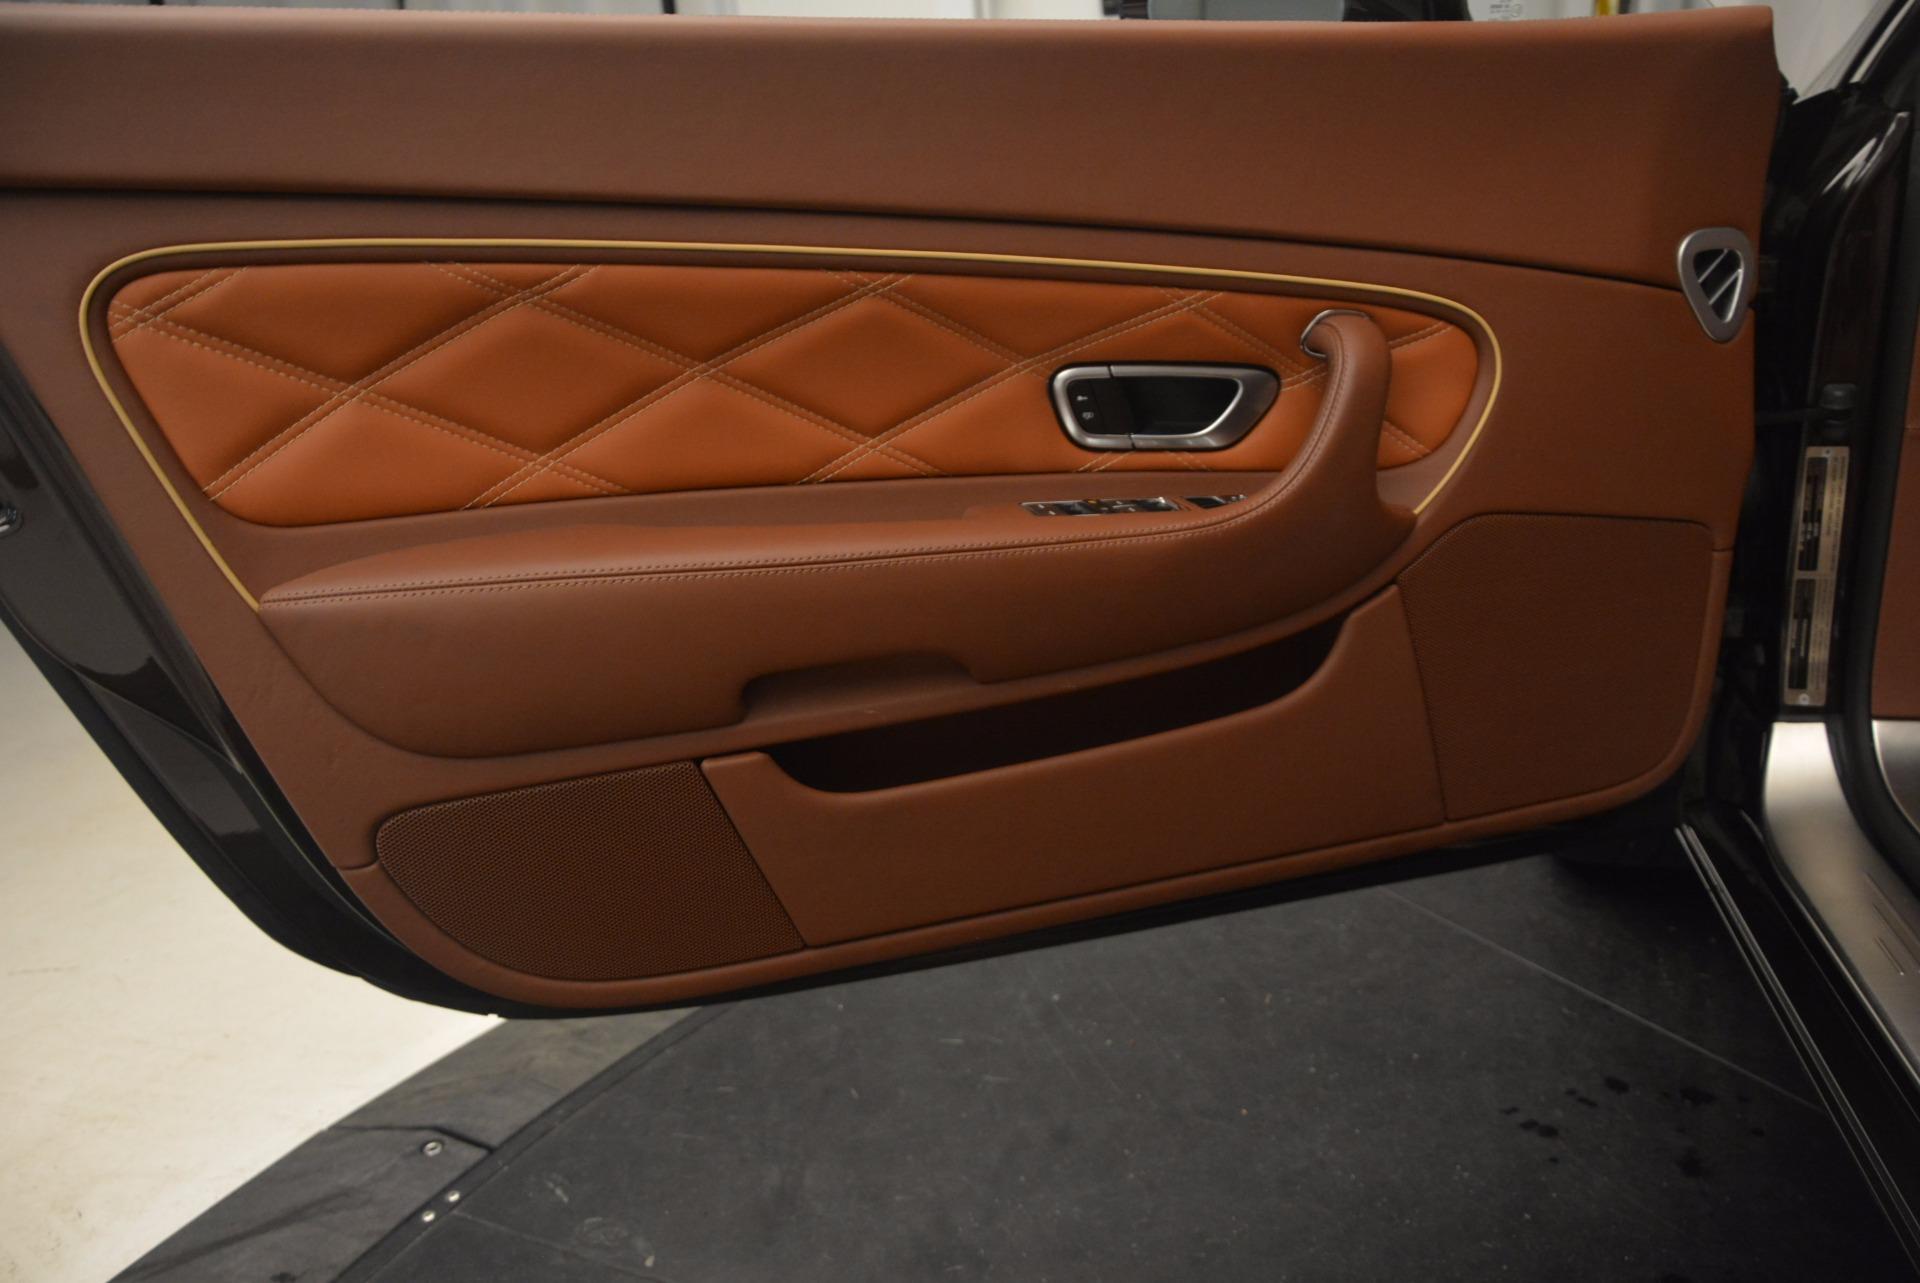 Used 2010 Bentley Continental GT Series 51 For Sale In Westport, CT 1222_p30